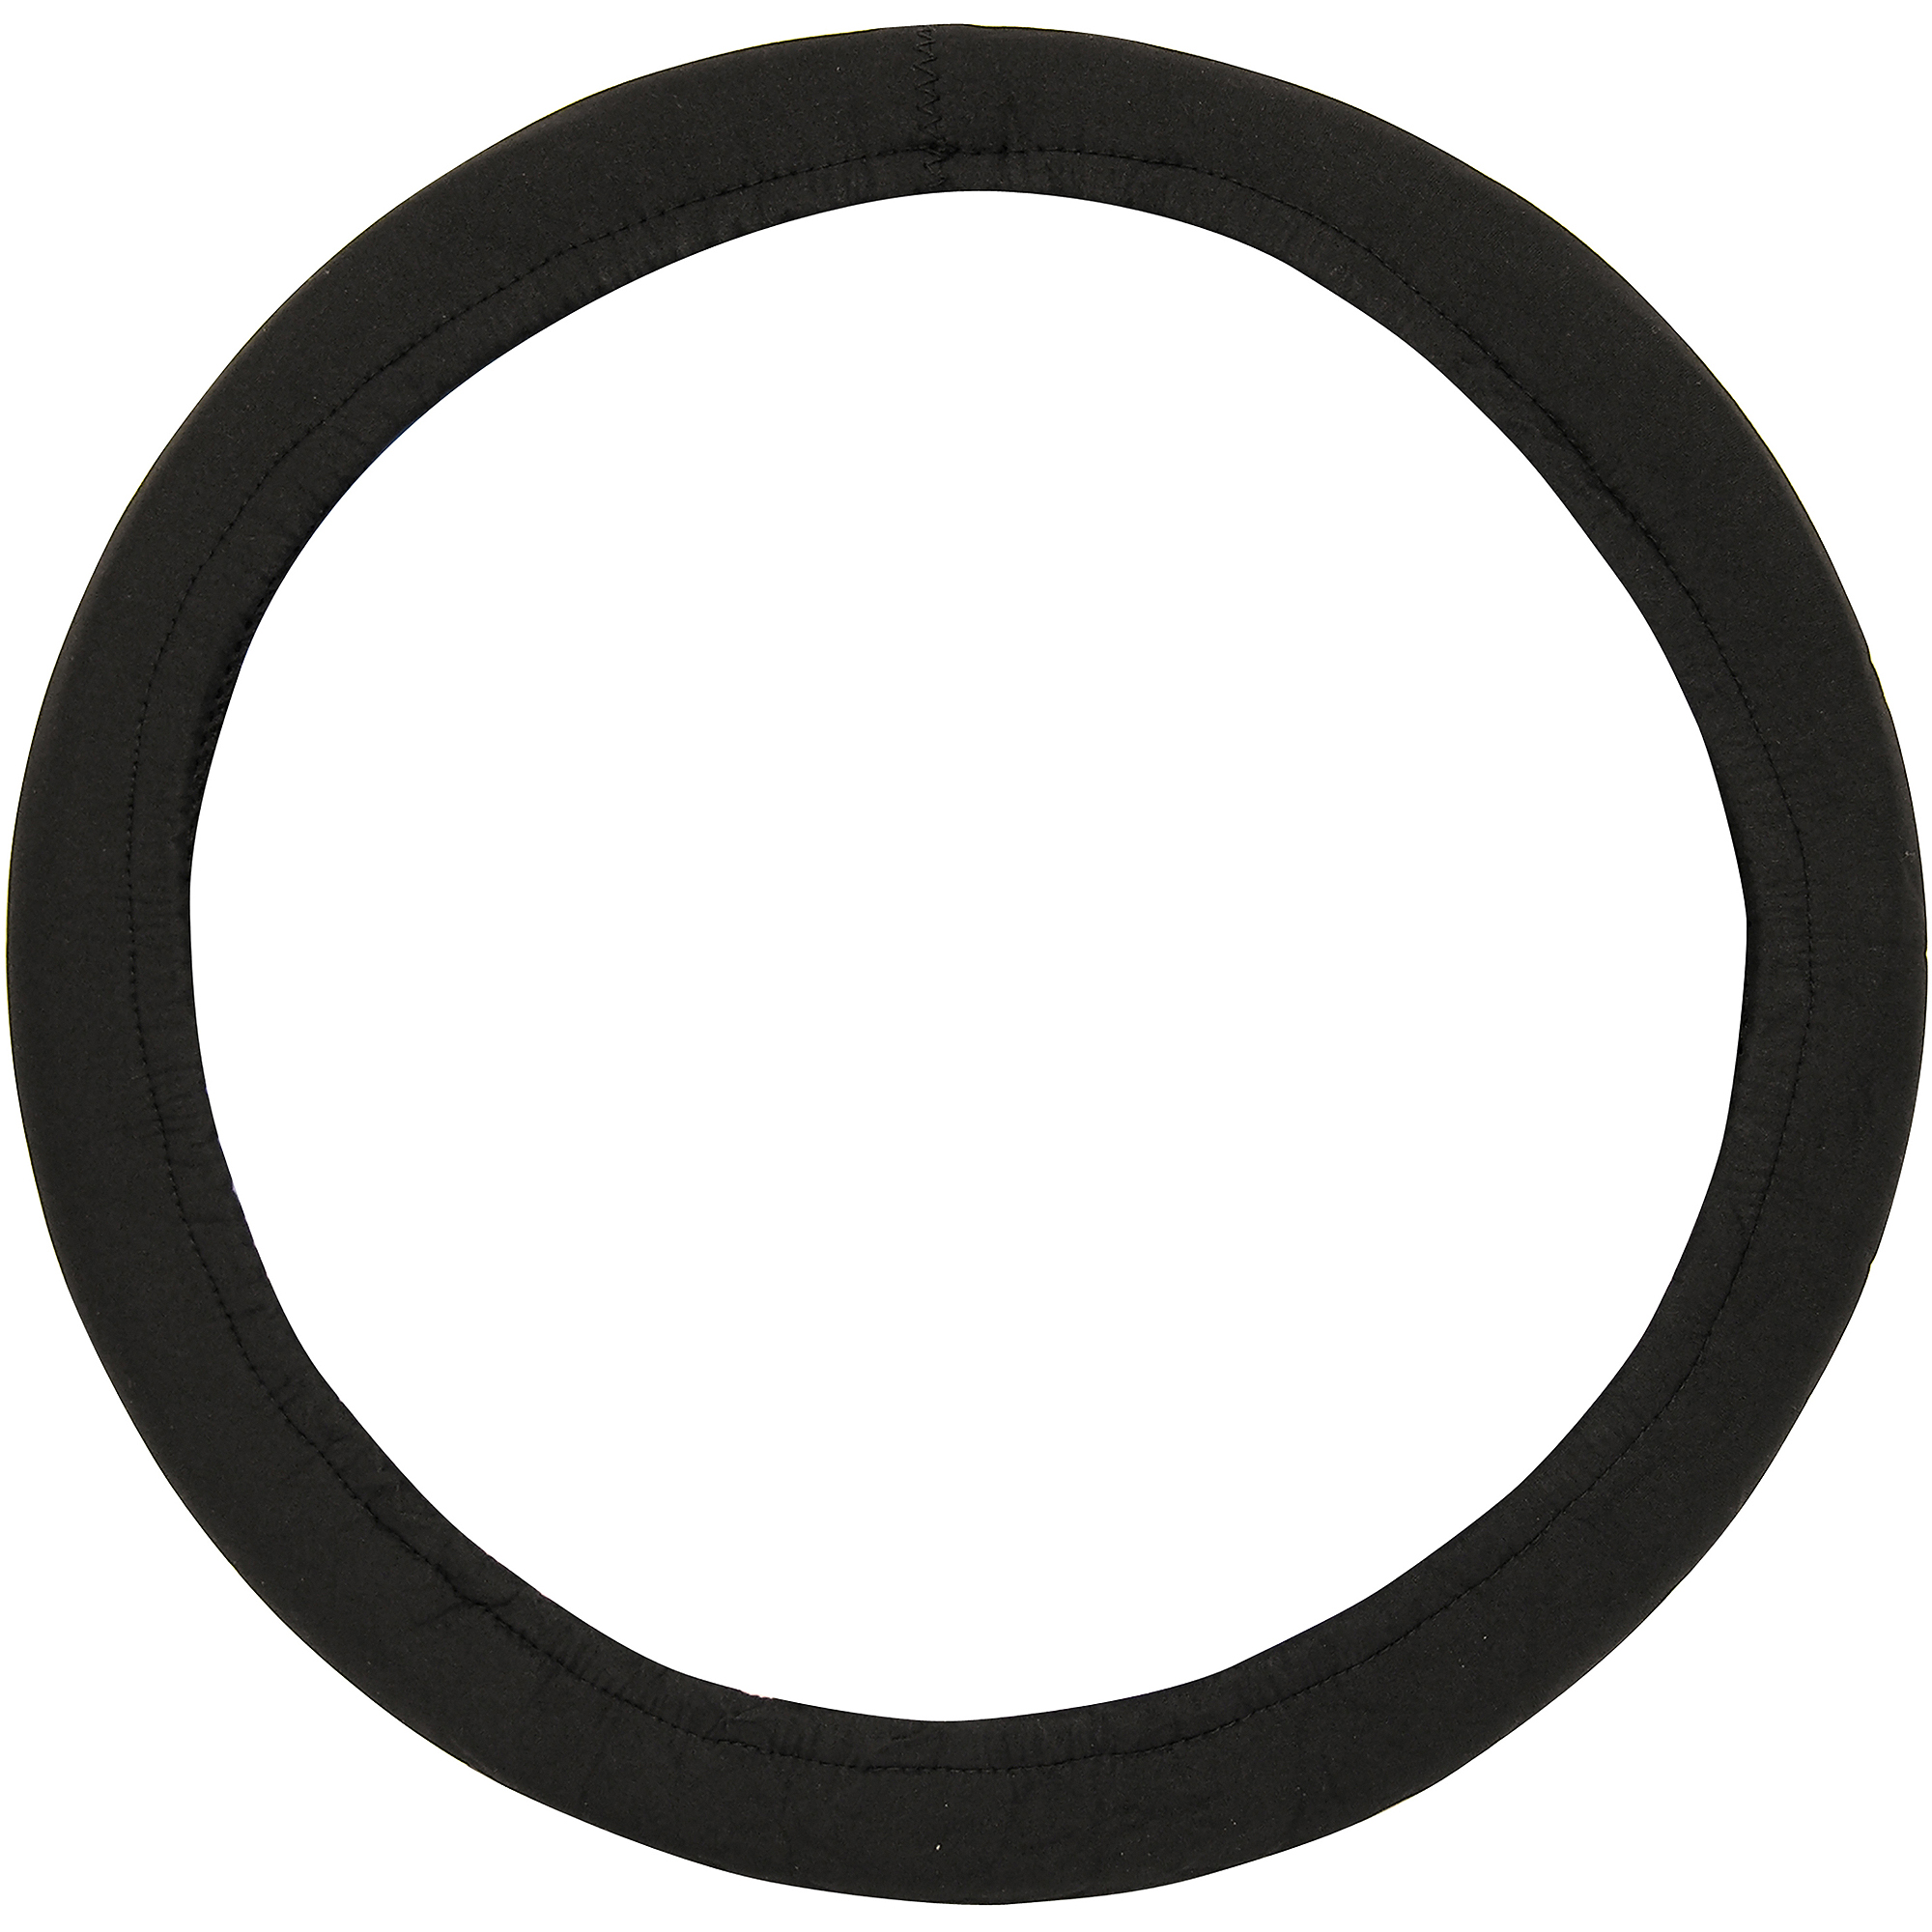 Auto Drive Neoprene Steering Wheel Cover, Black